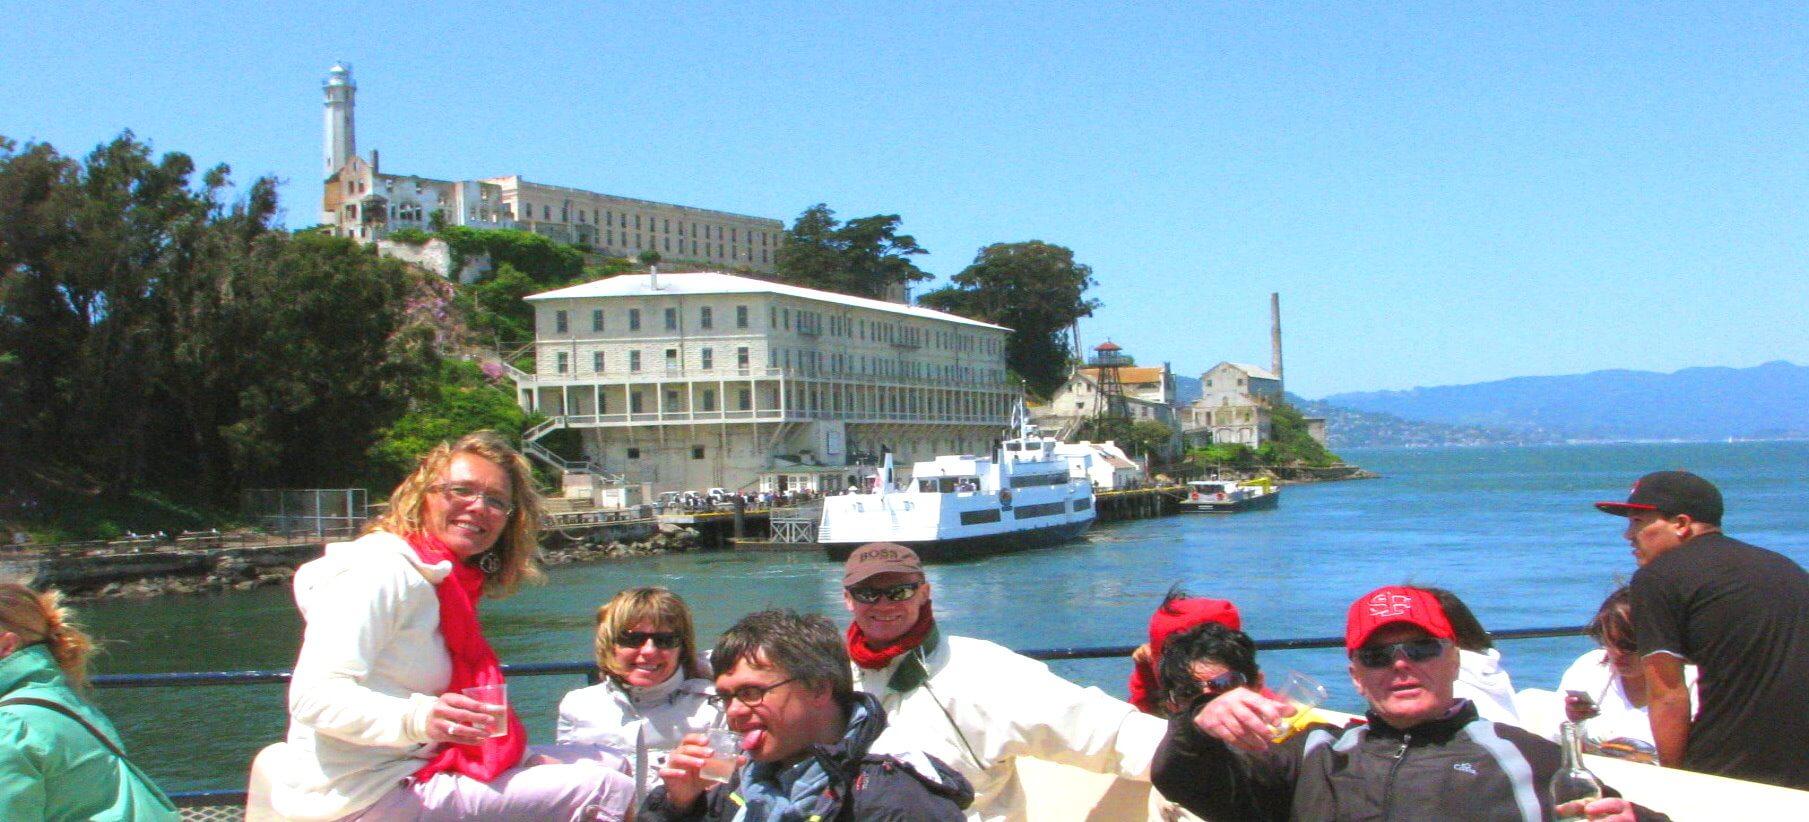 alcatraz-ferry-ride-tour-around-alcatraz-island-prison